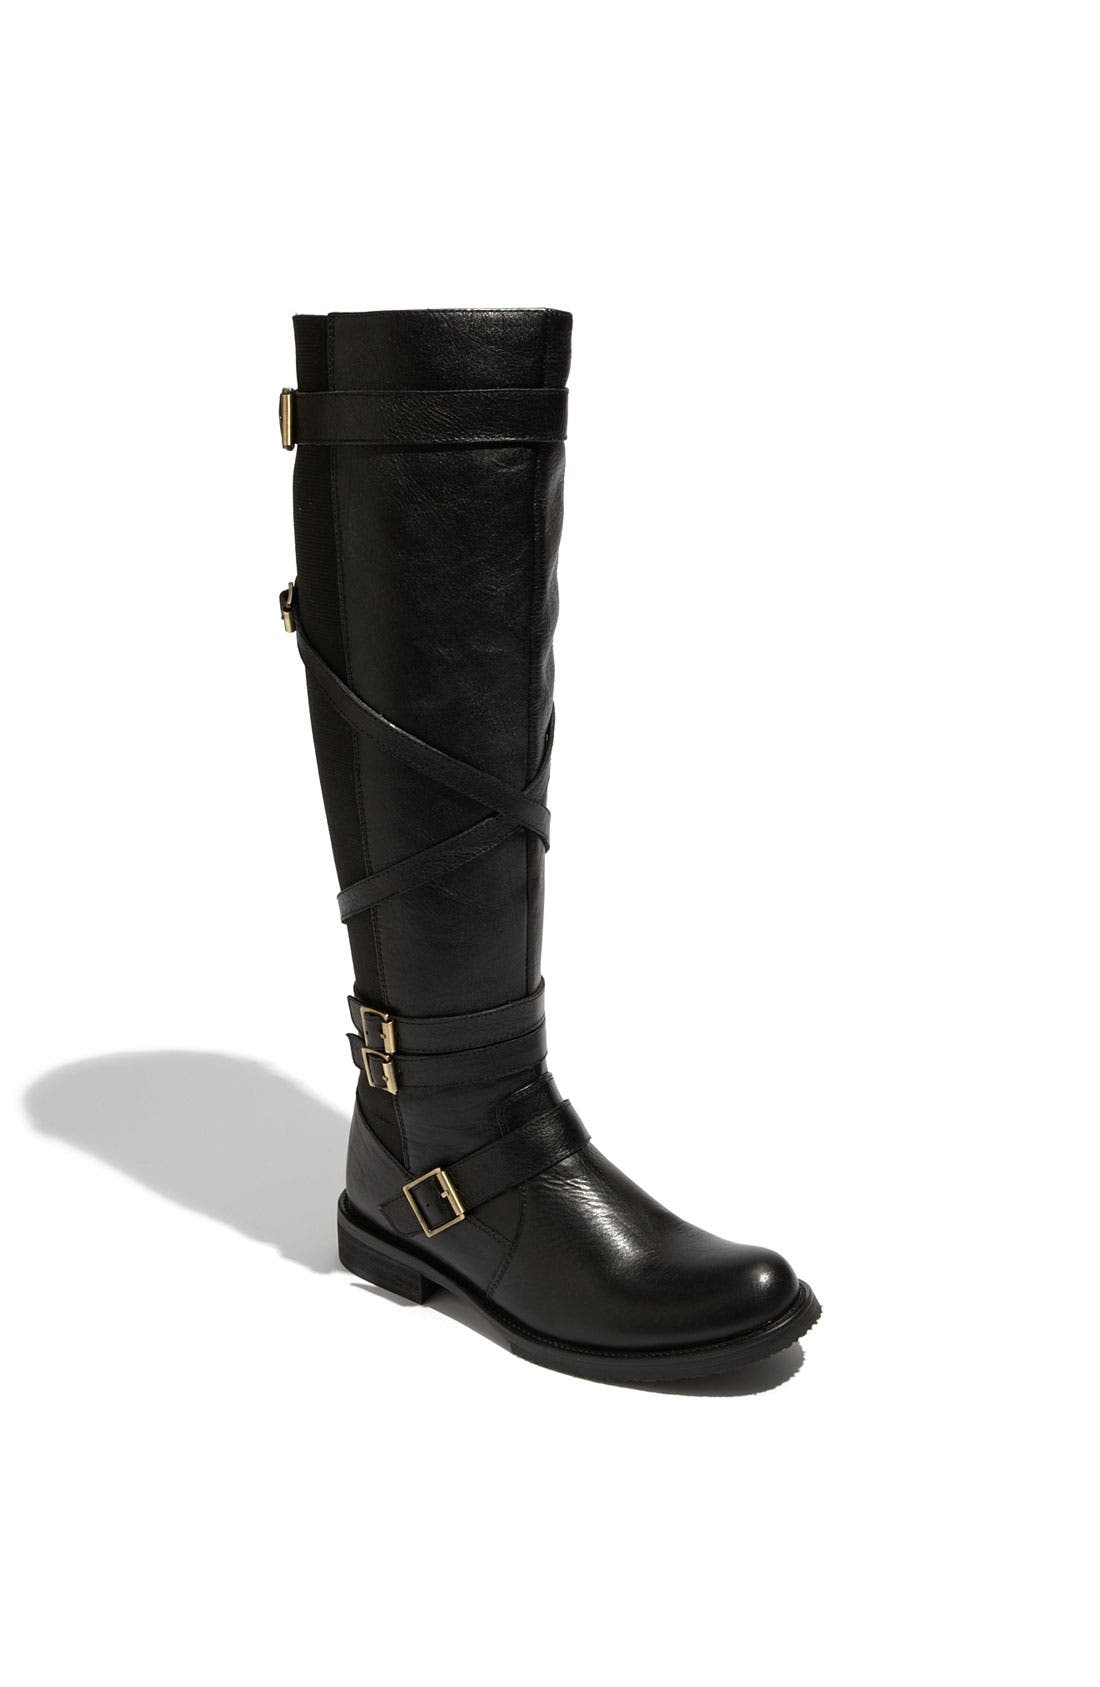 Alternate Image 1 Selected - Miz Mooz 'Kira' Riding Boot